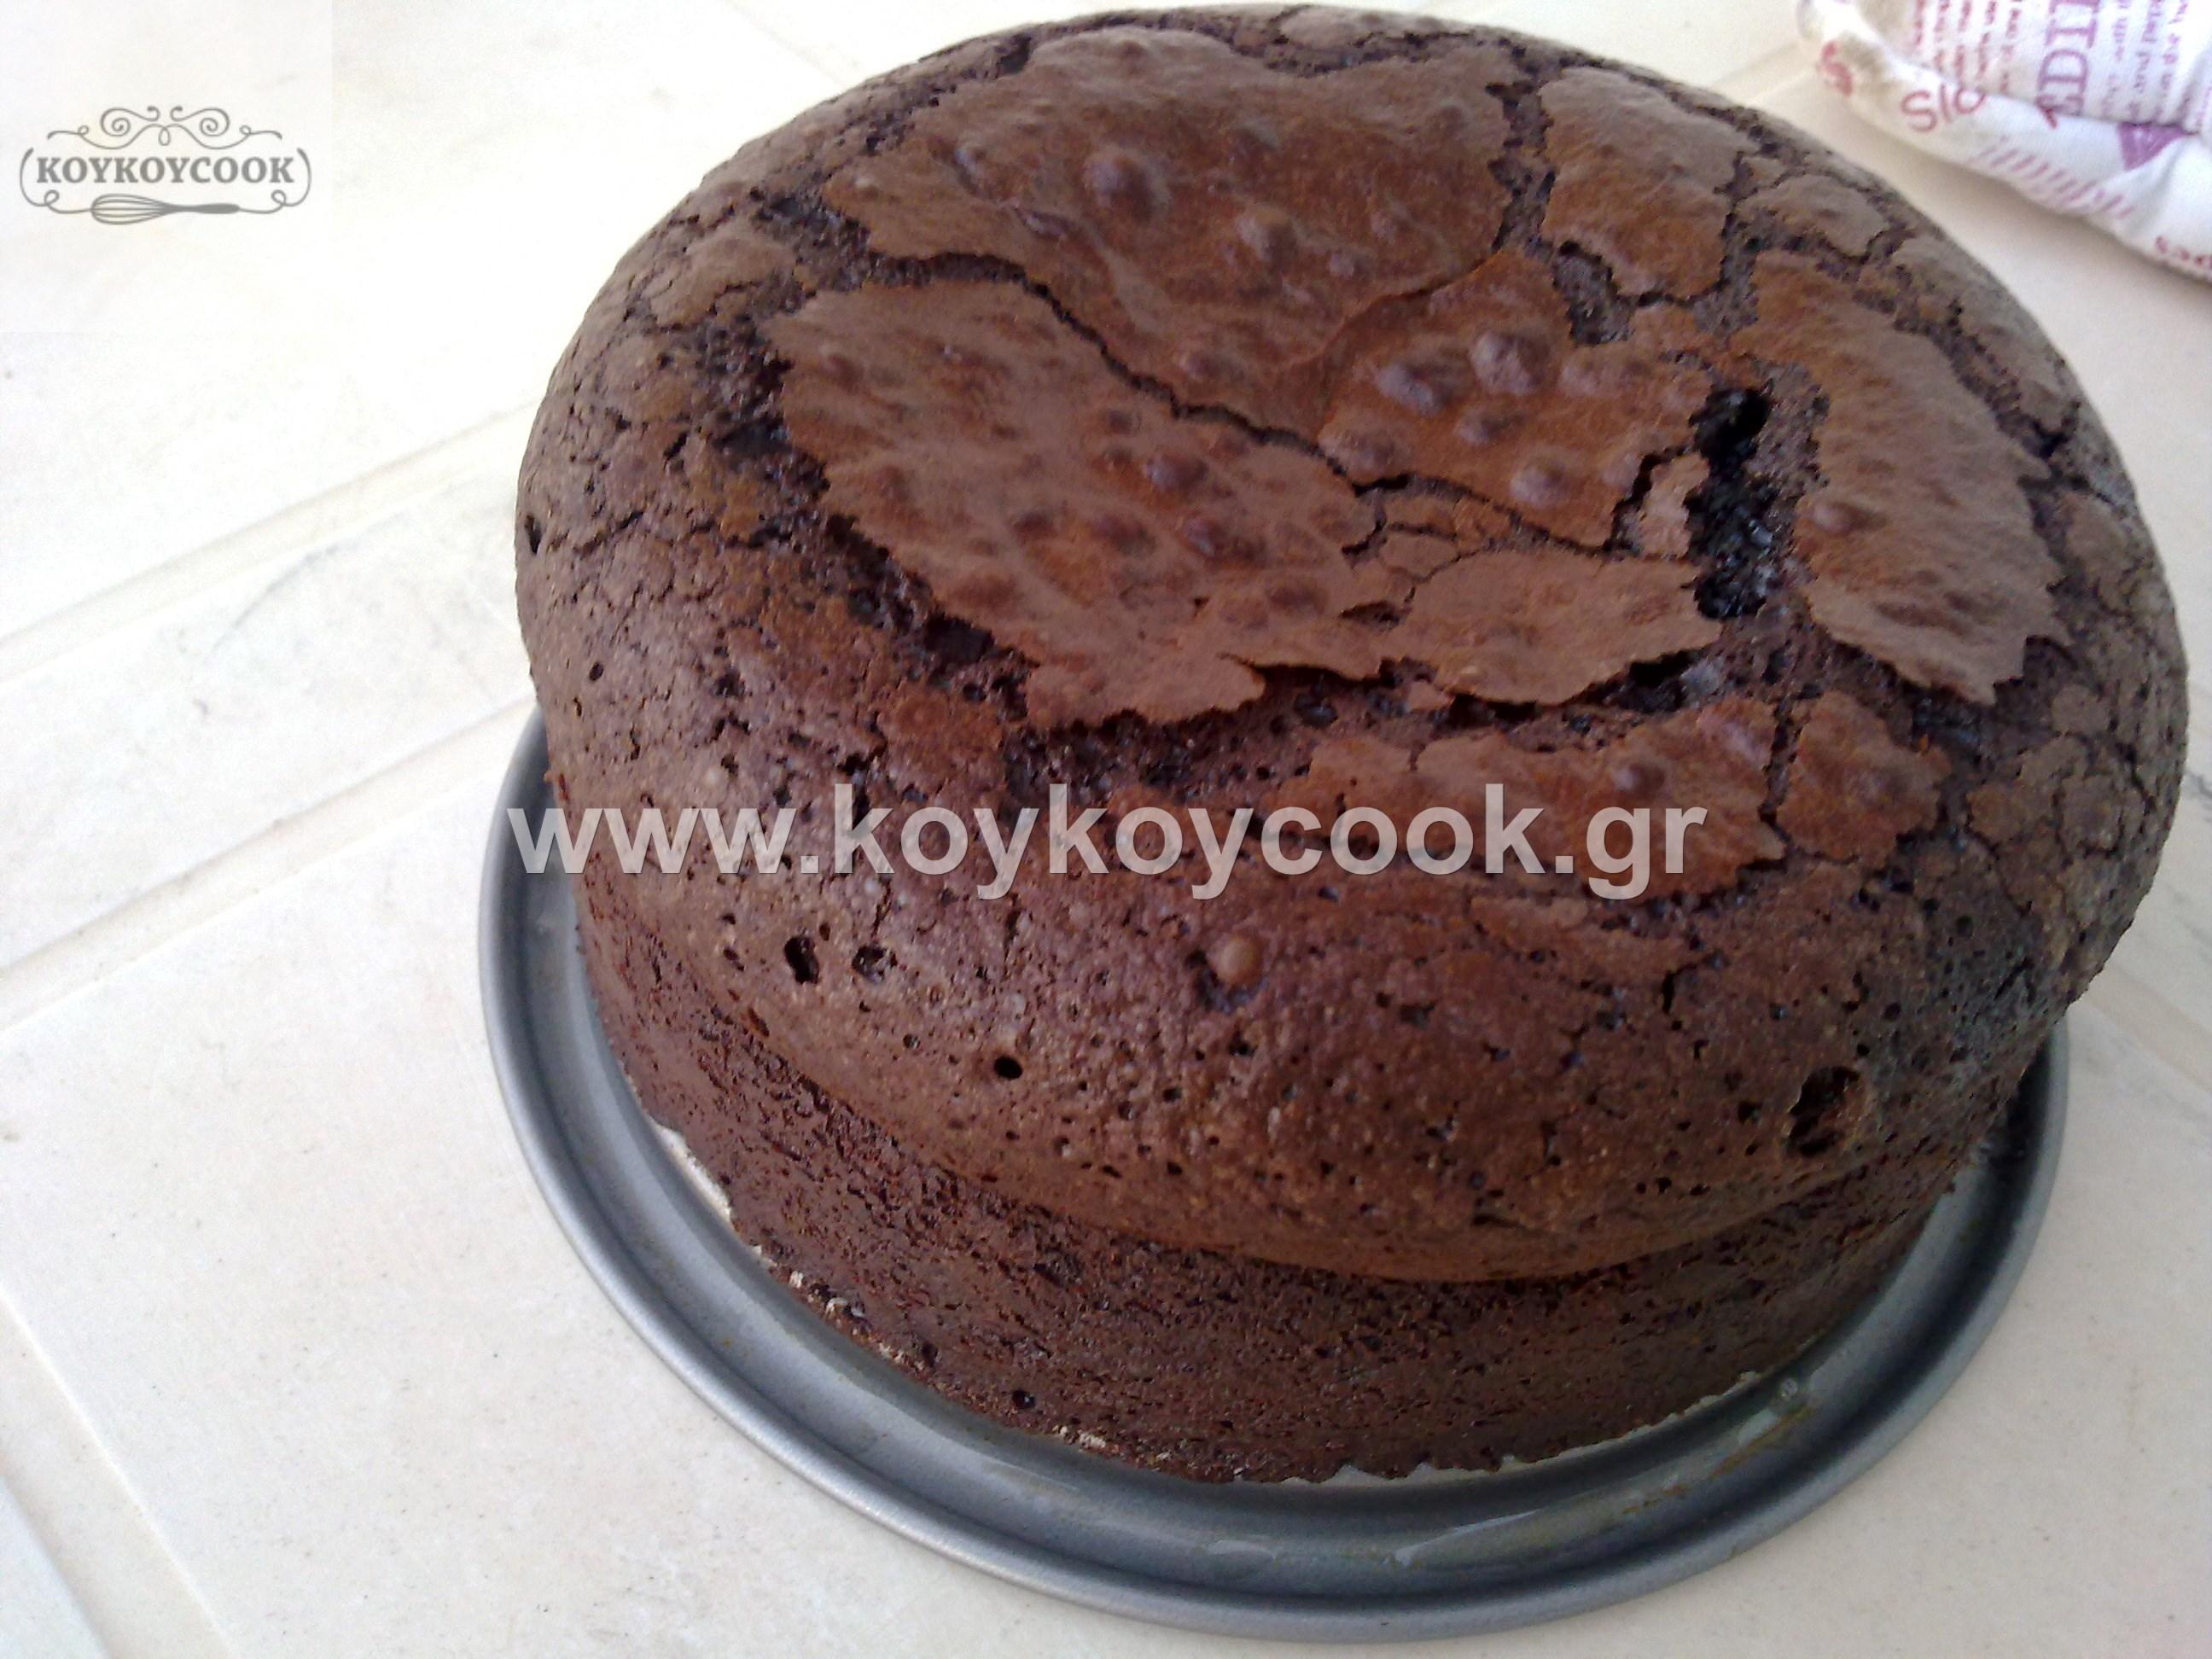 CHOCOLATE FUDGE CAKE ΧΩΡΙΣ ΑΛΕΥΡΙ (GLUTEN FREE)